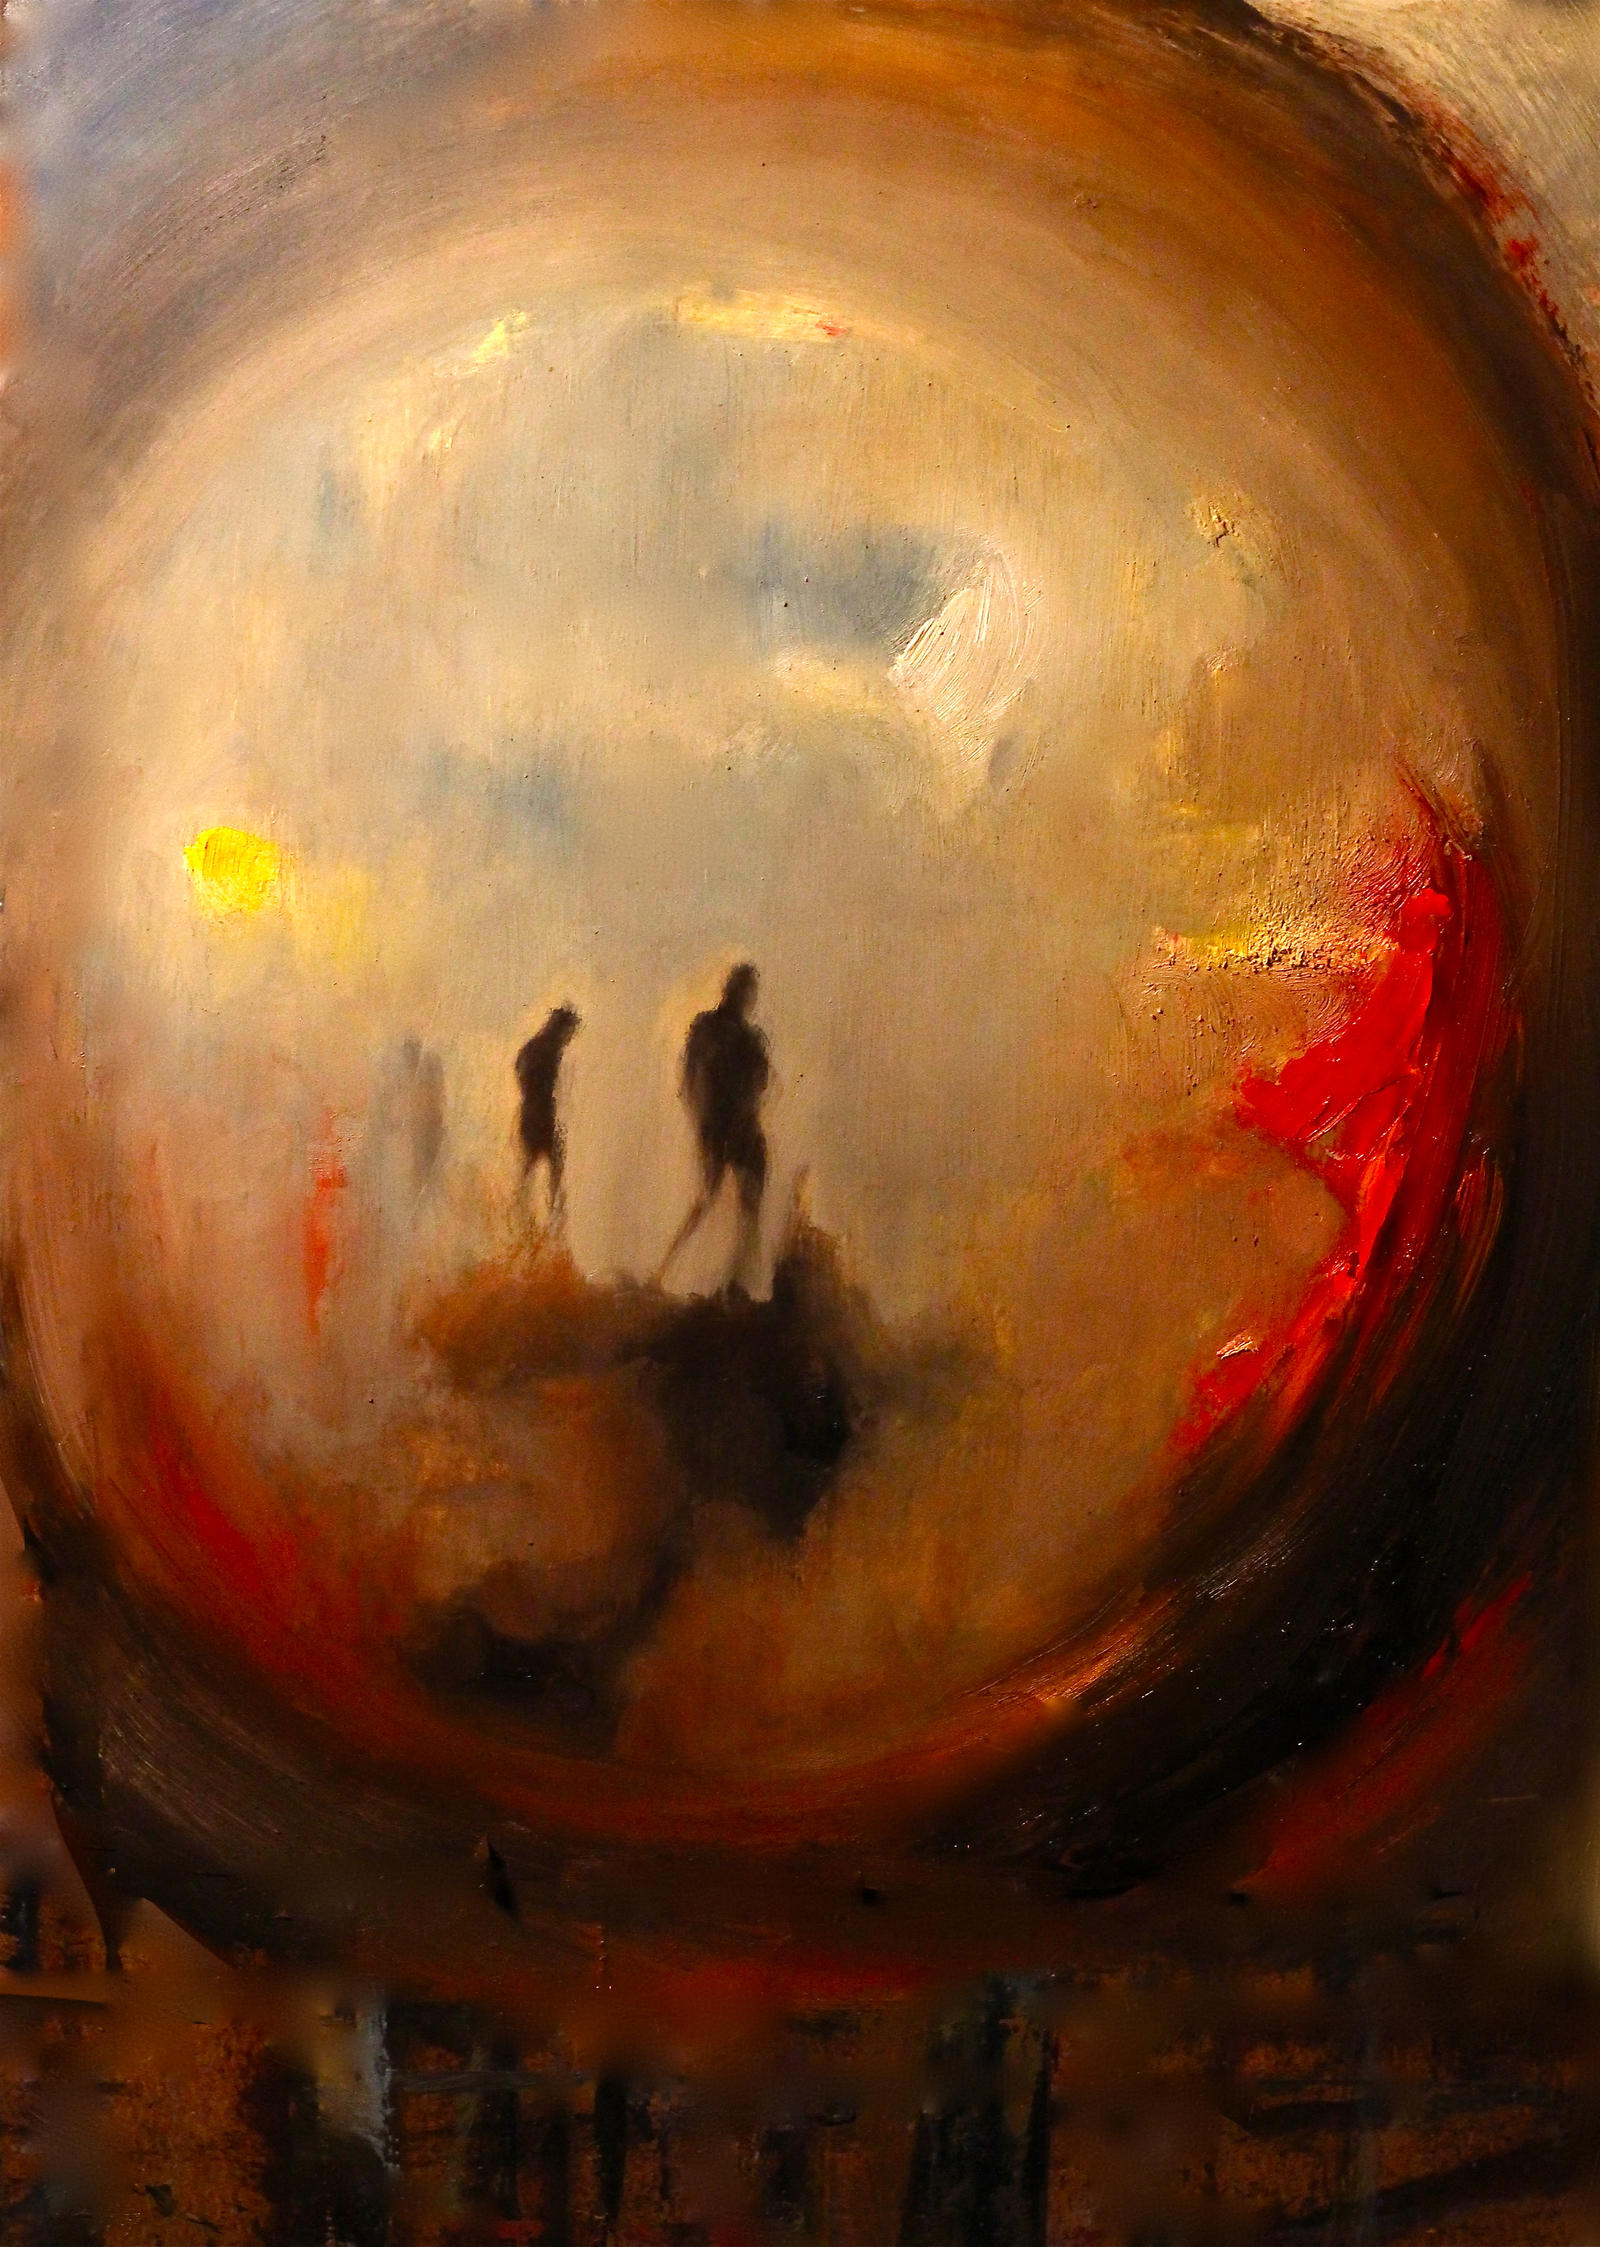 Dream Without Interpretation by DeLumine